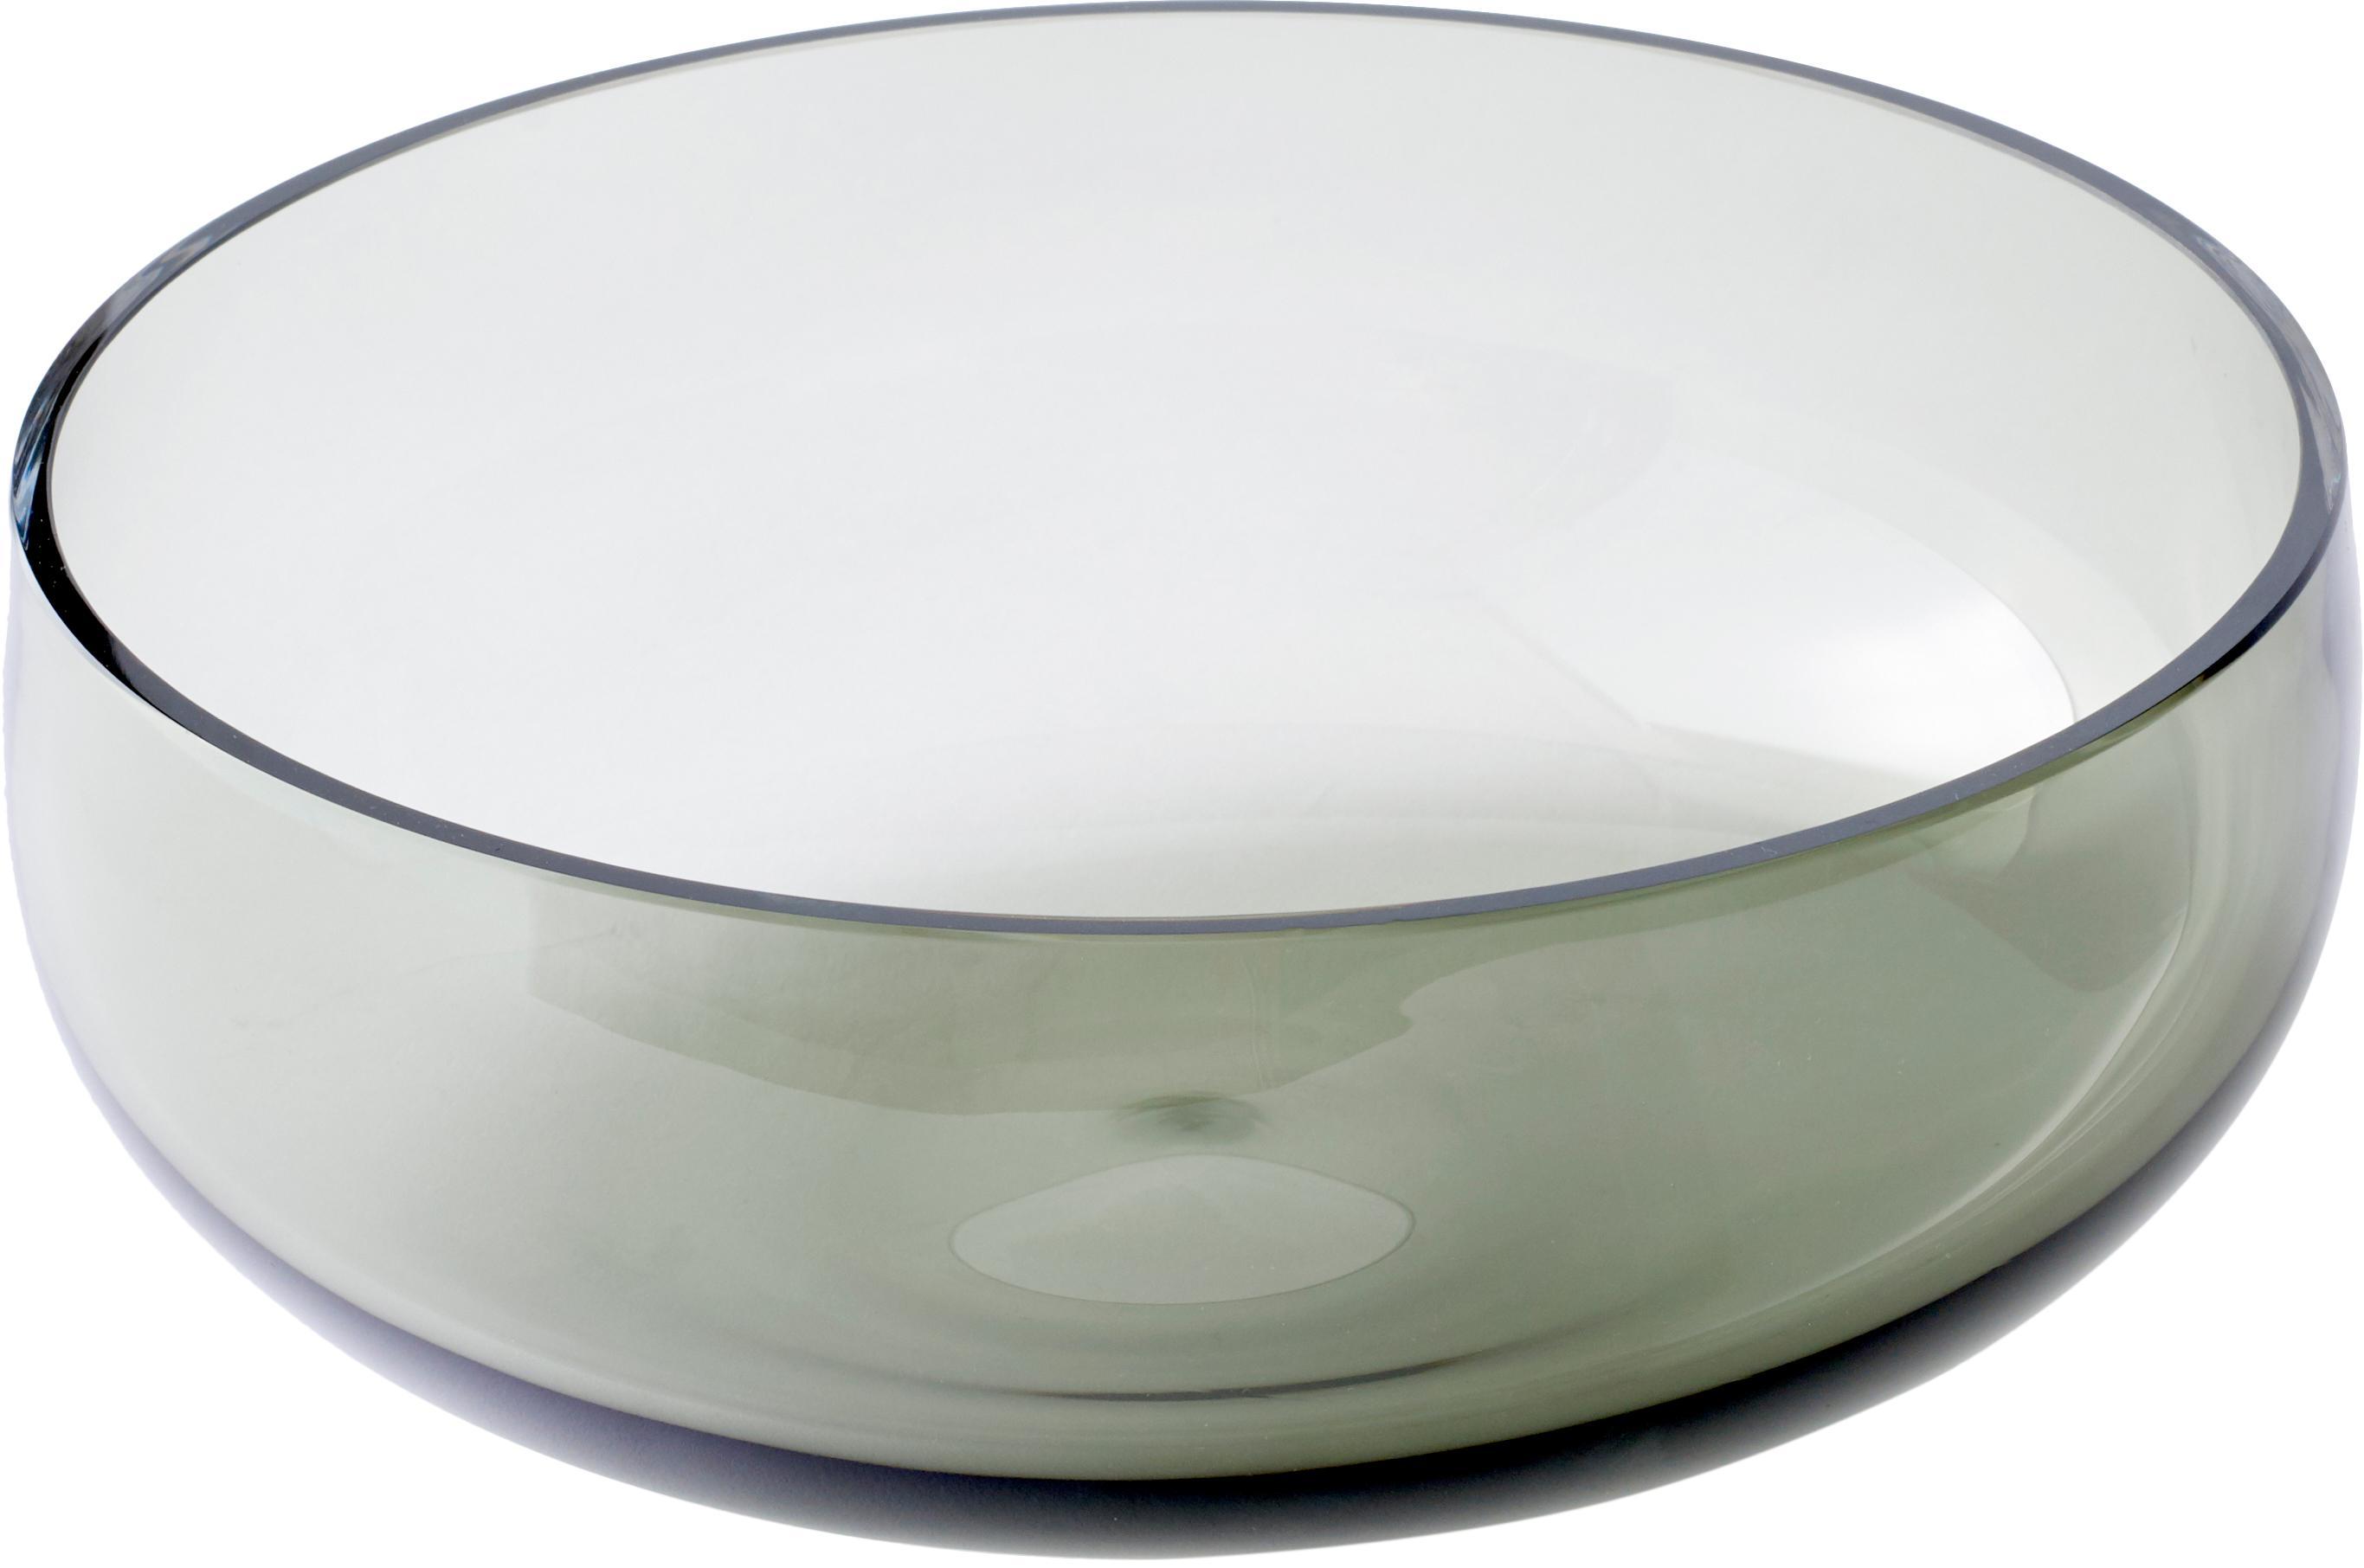 Schaal Échasse, Frame: messing, Frame: messingkleurig. Vaas: grijs, Ø 30 x H 14 cm